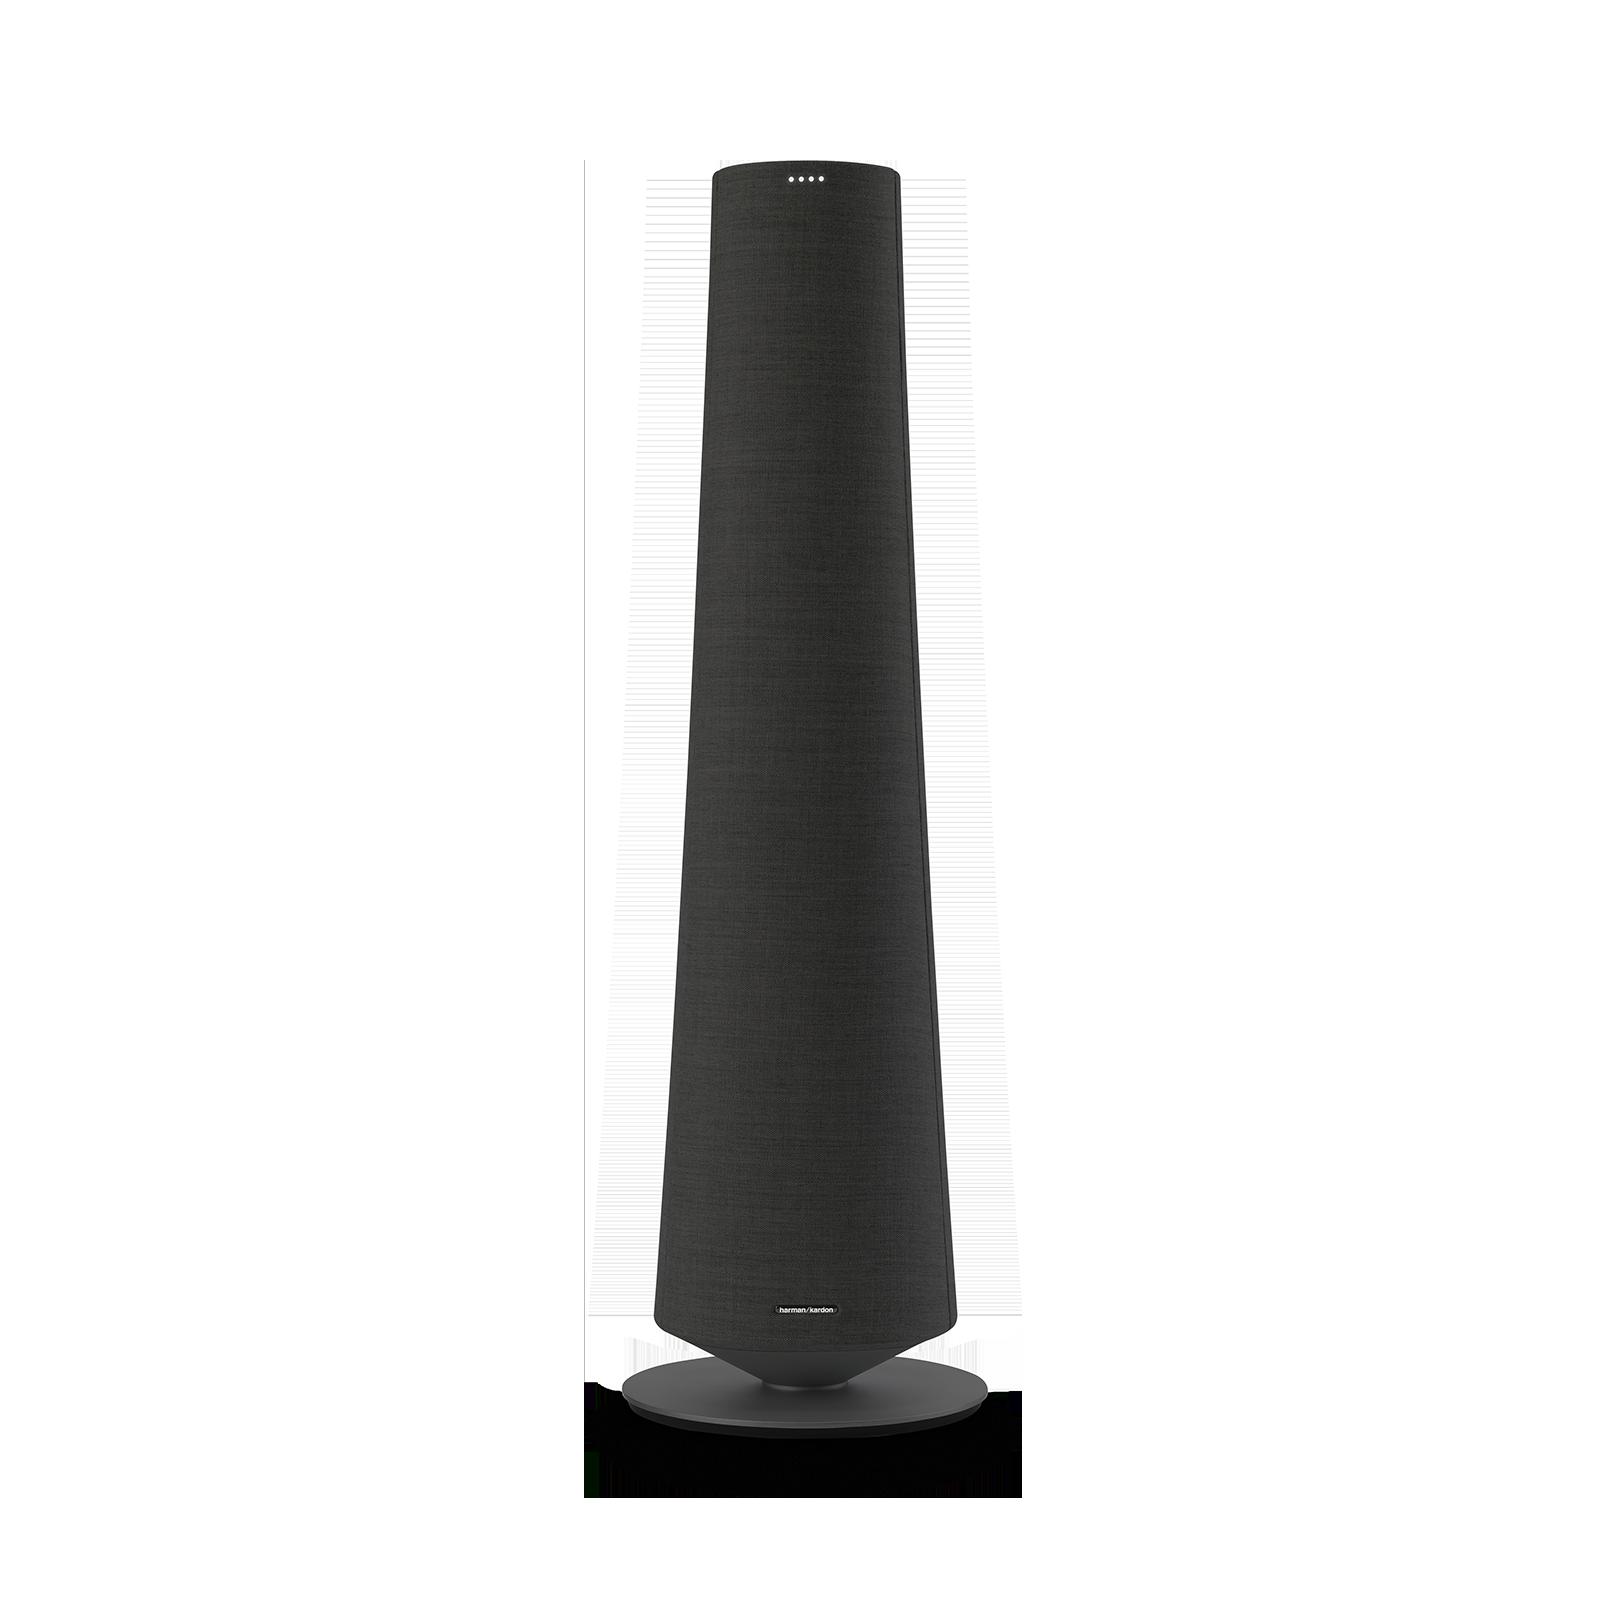 Harman Kardon Citation Tower - Black - Smart Premium Floorstanding Speaker that delivers an impactful performance - Front